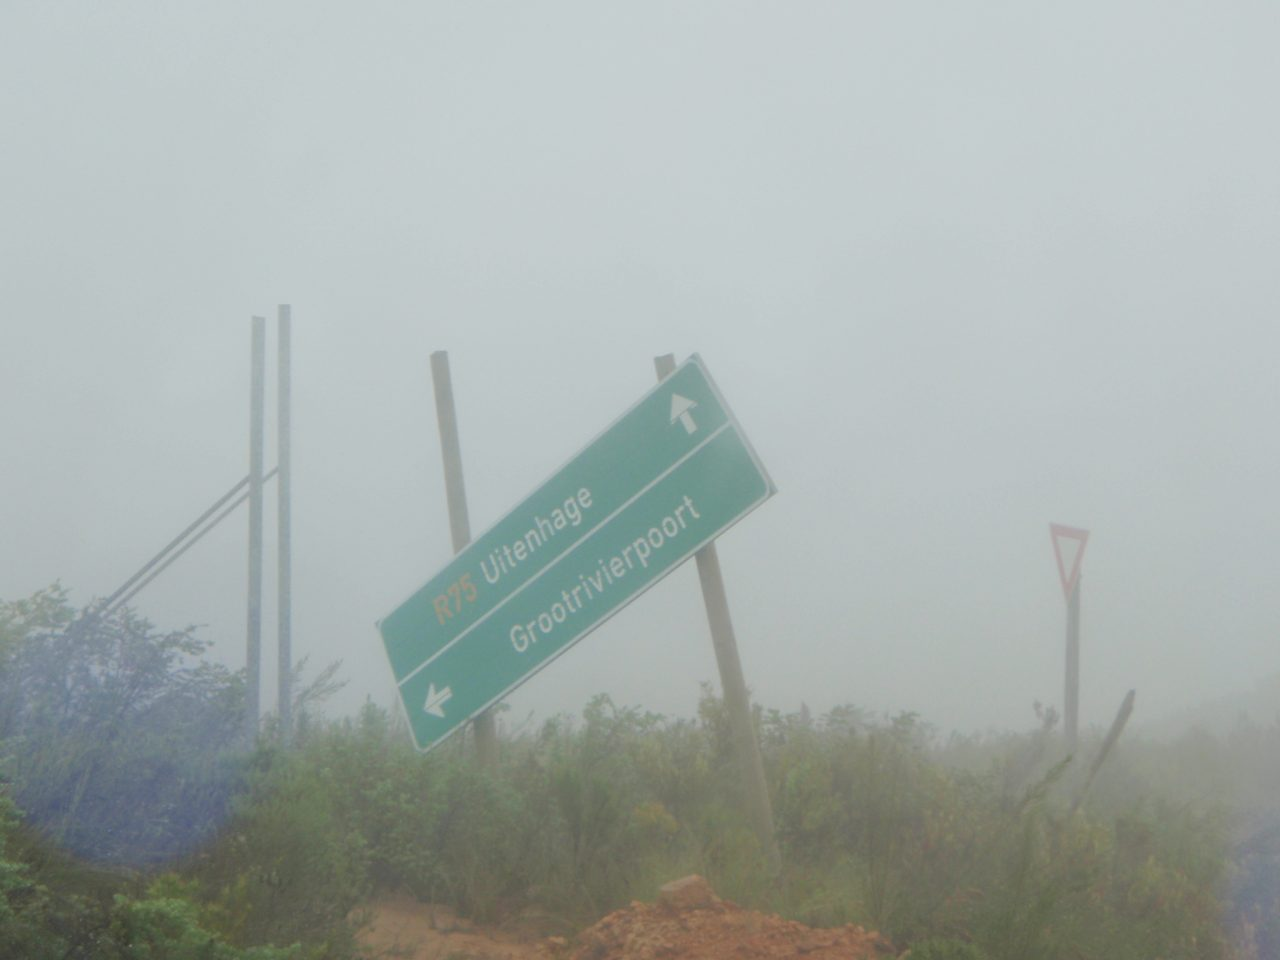 Schild im Nebel